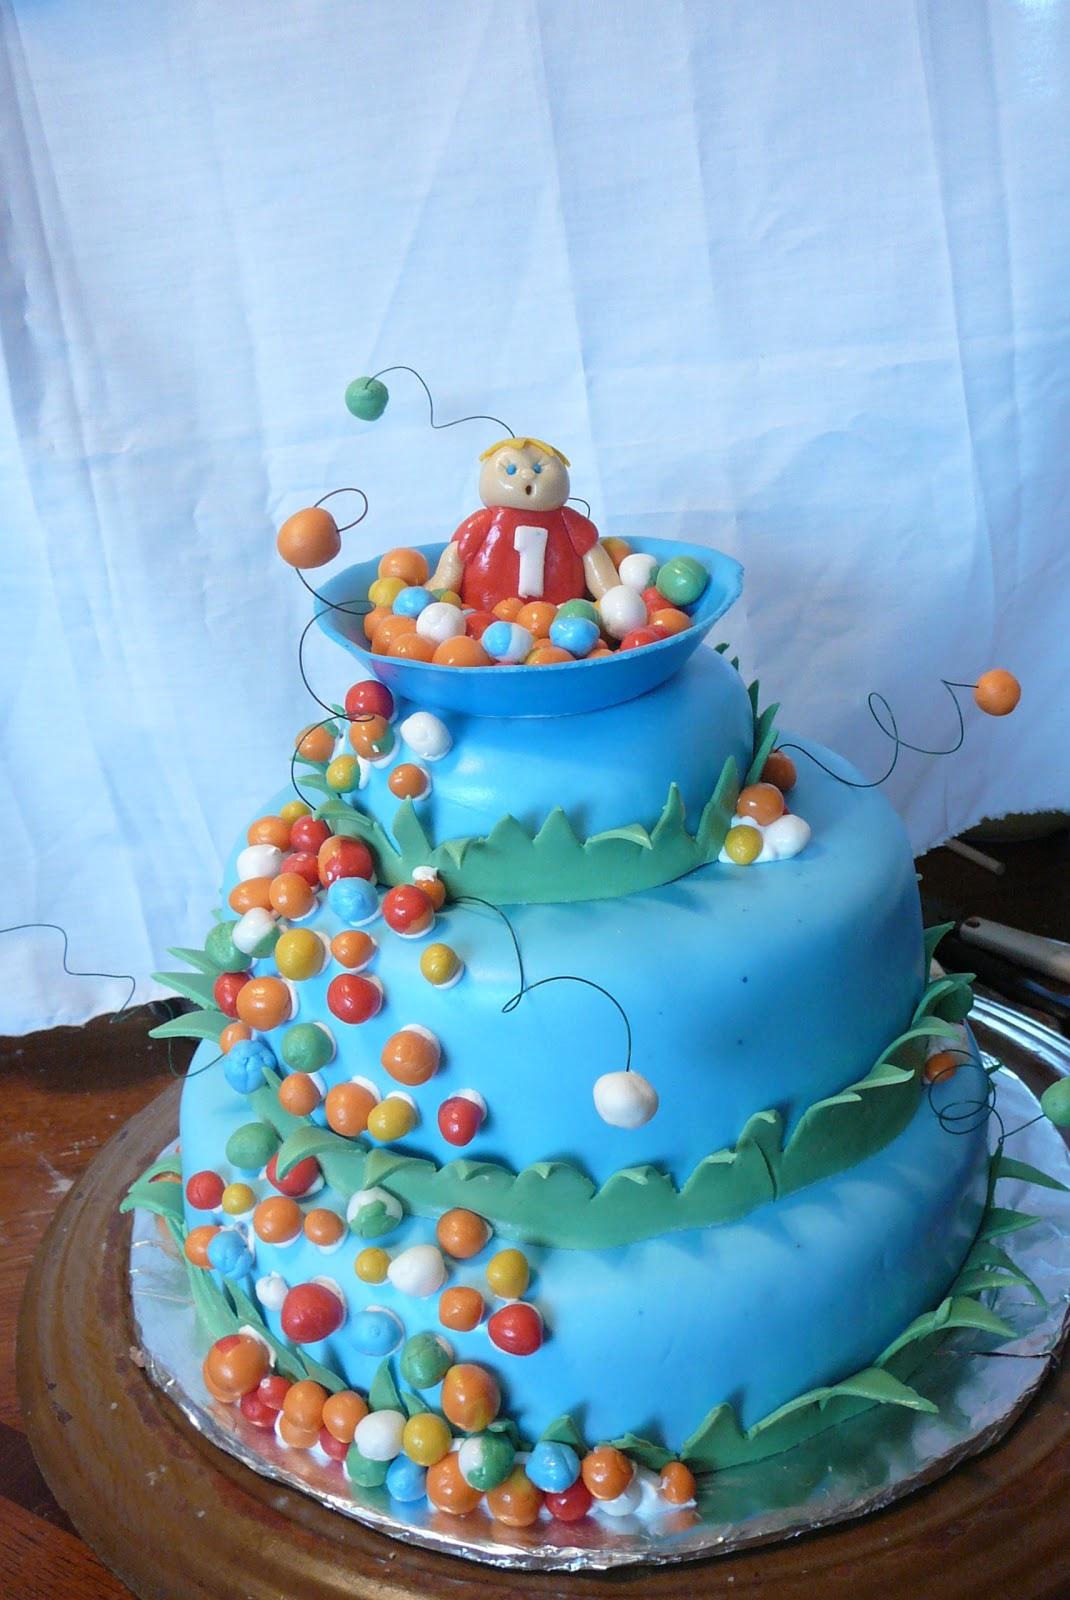 Bakeshows Cake show: Ball Pit Birthday